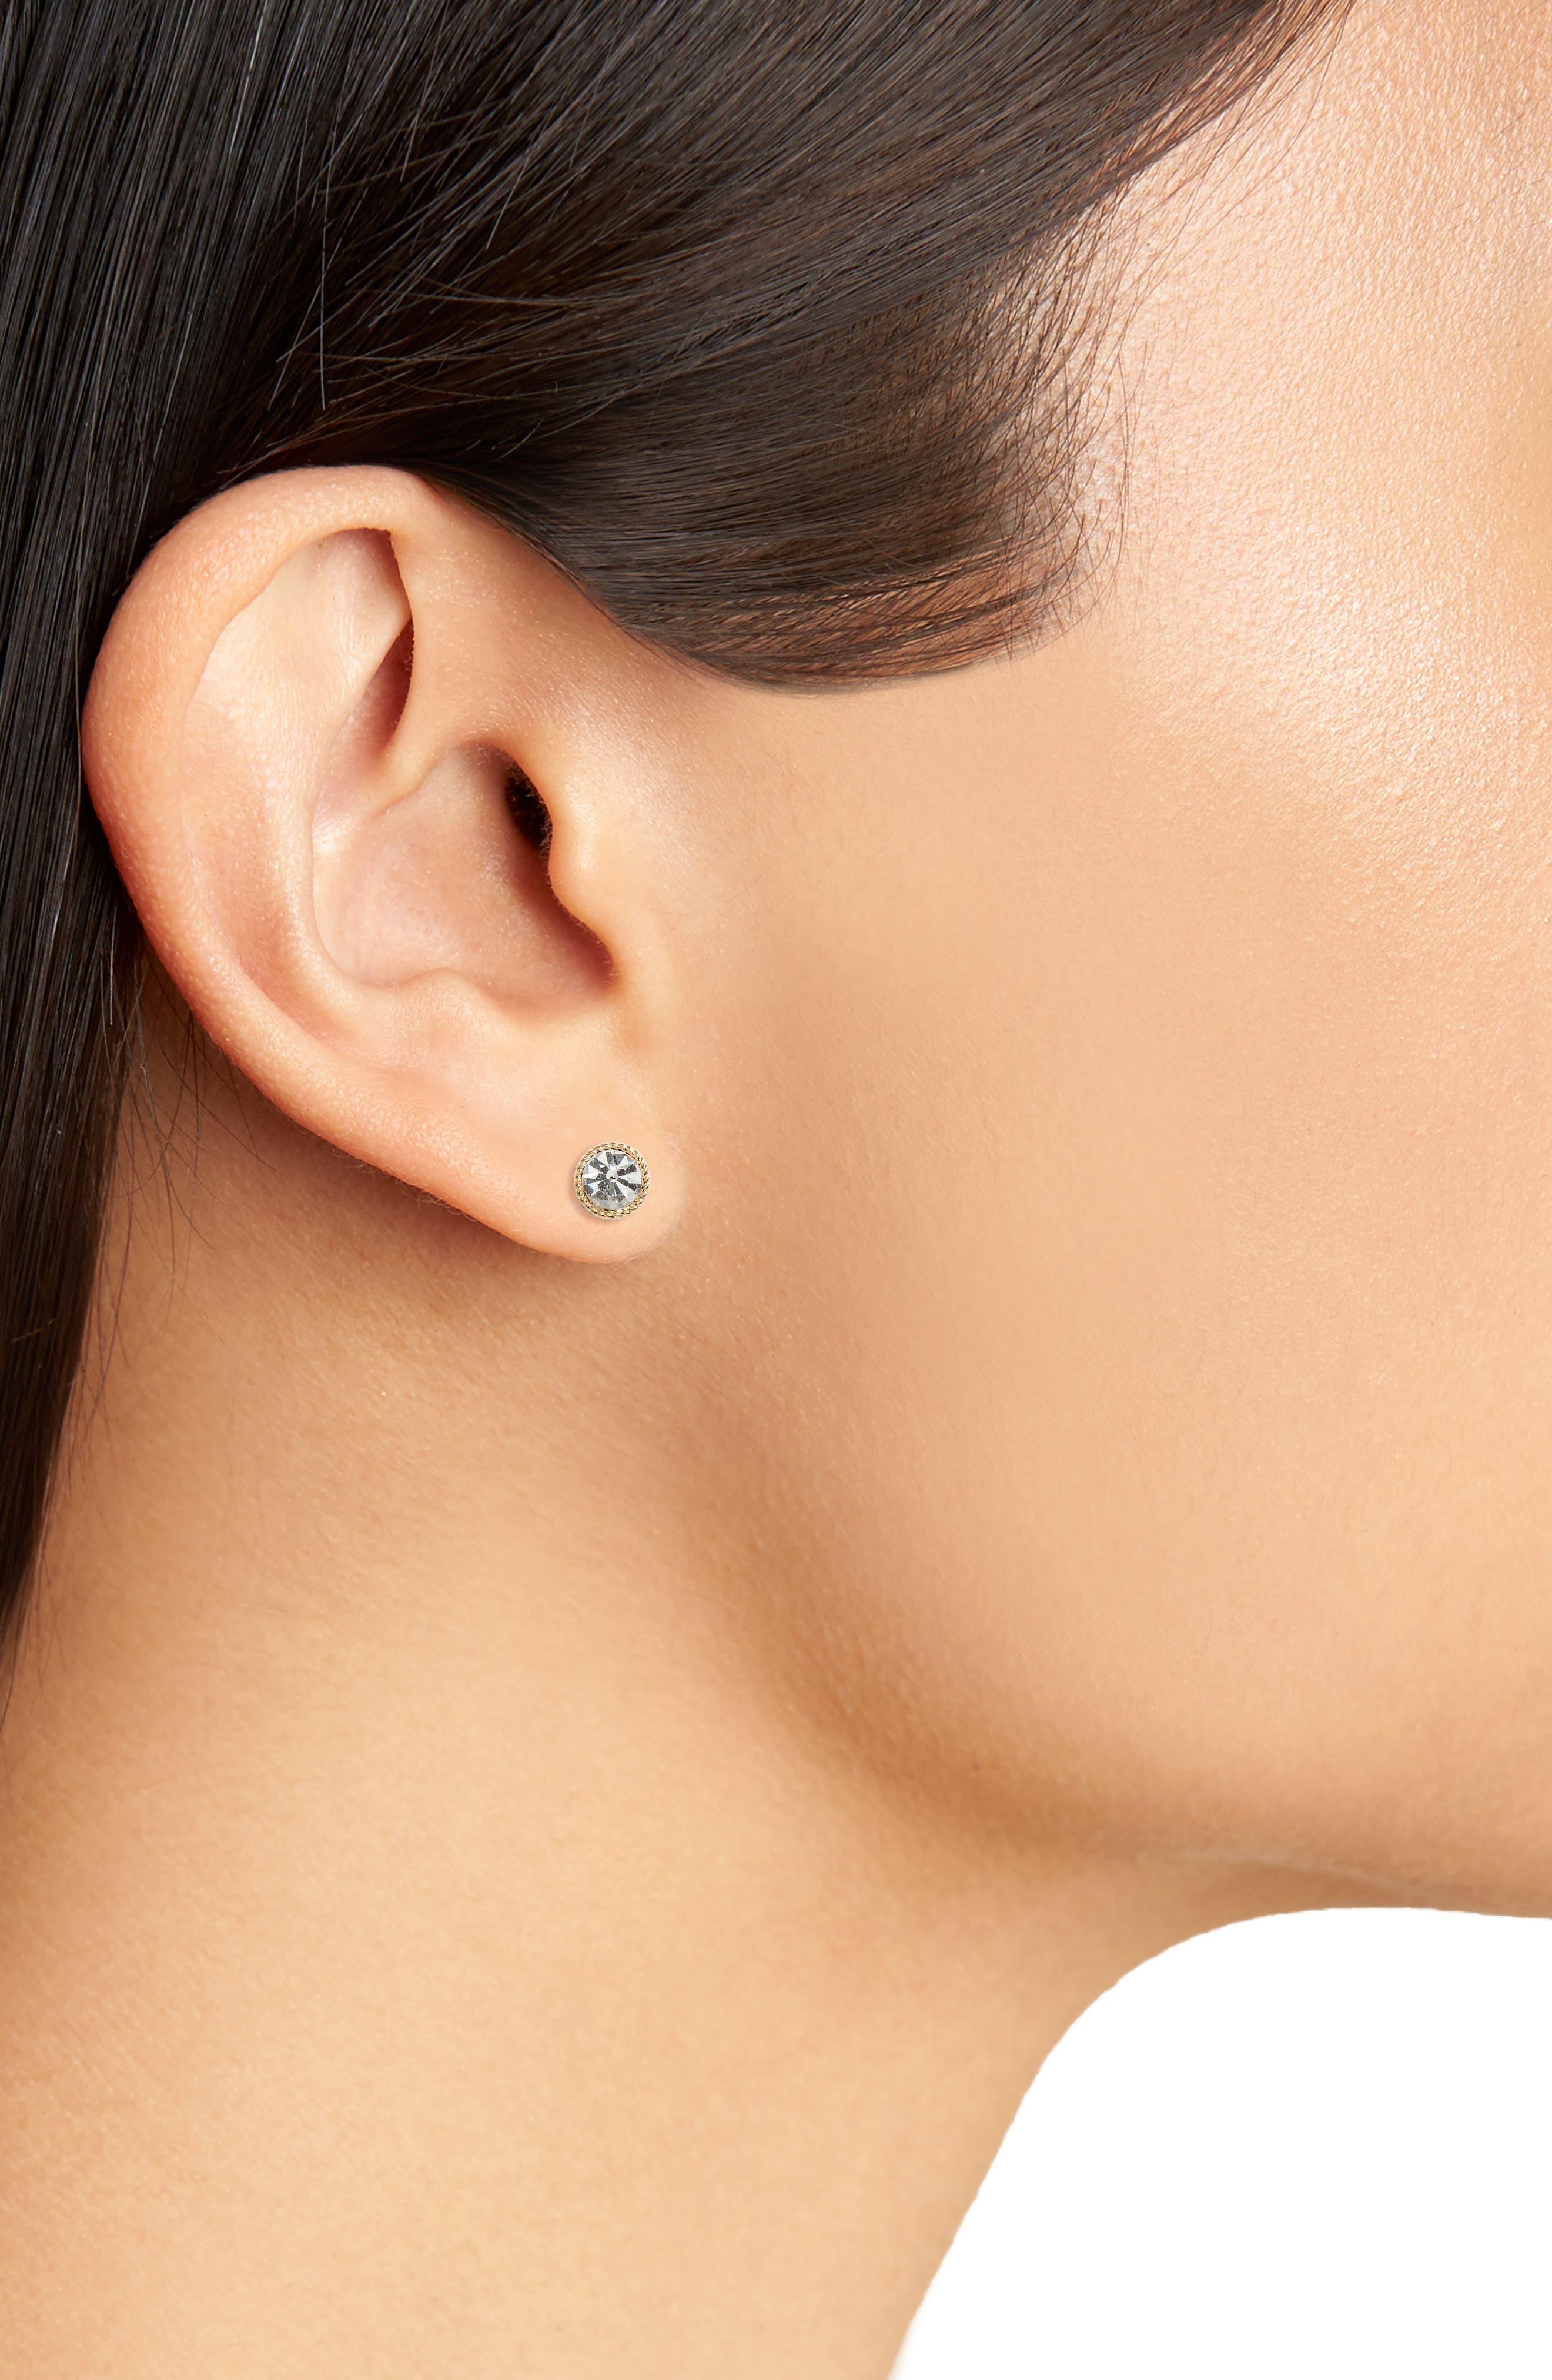 Set of 4 Stud Earrings,                             Alternate thumbnail 2, color,                             710